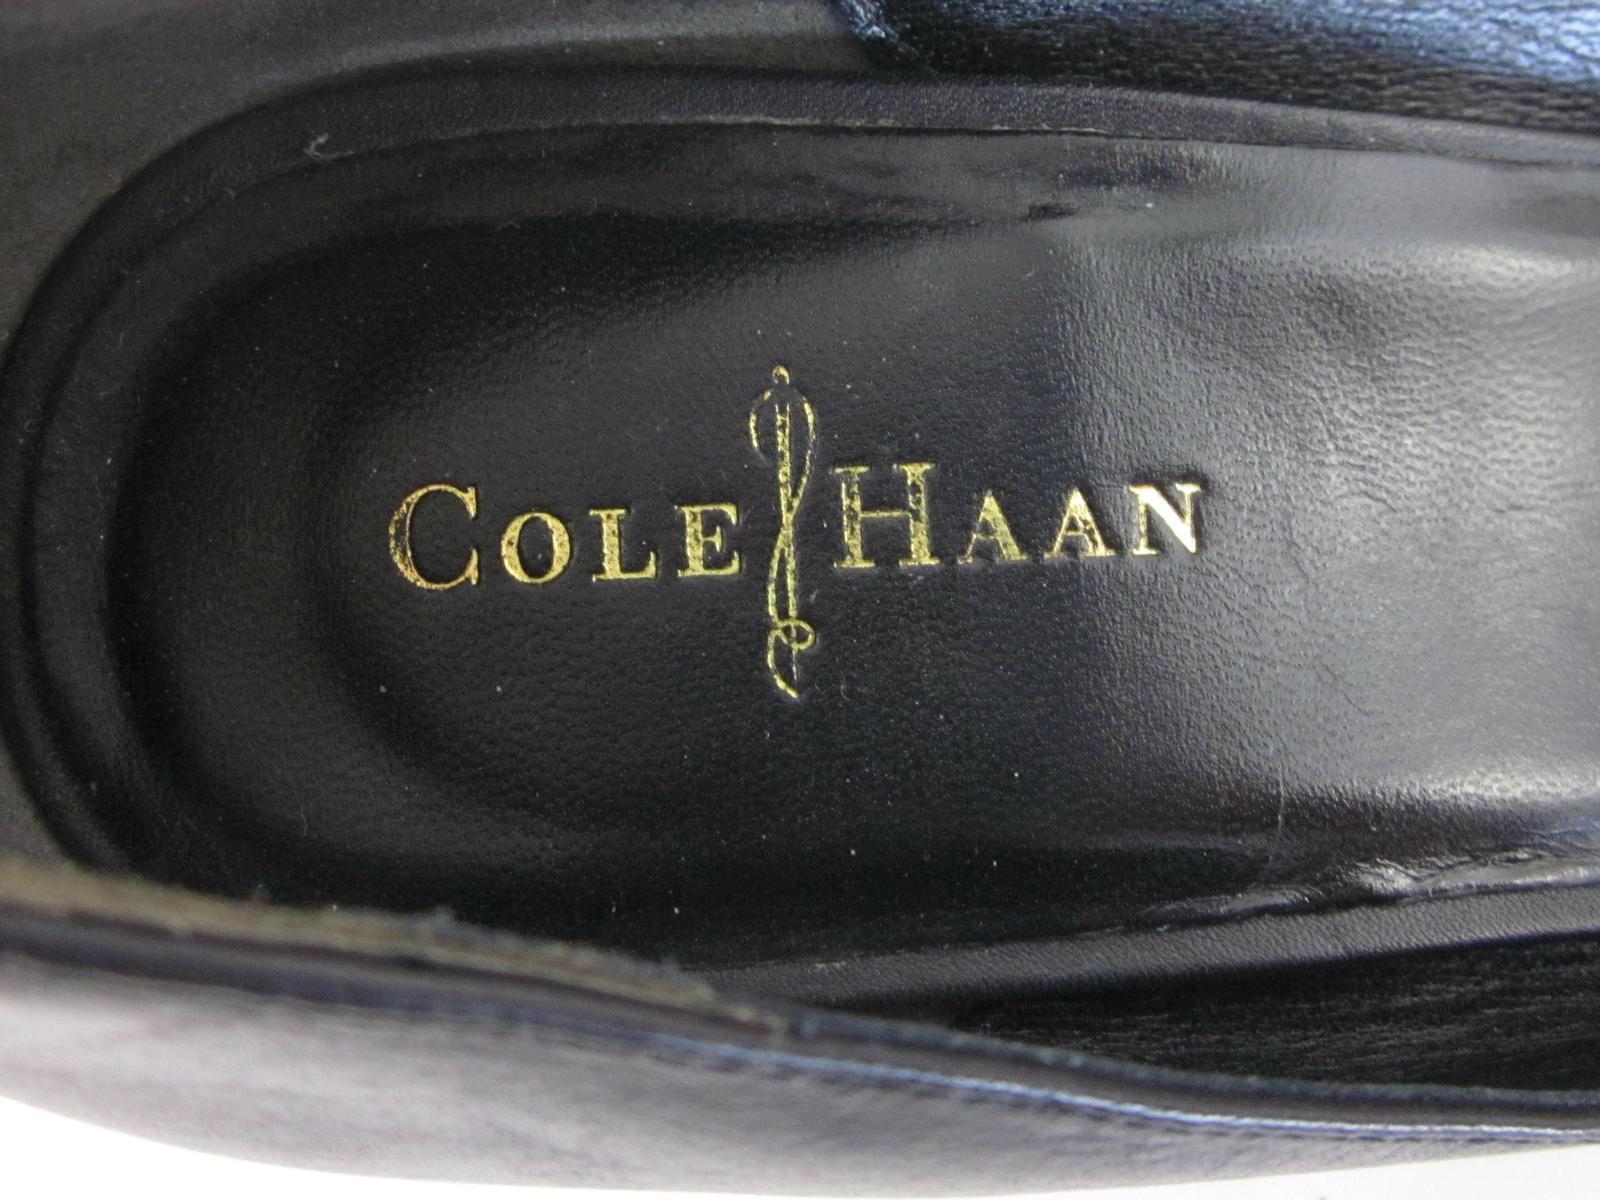 Cole Haan 'Air Talia Wedge' Round Toe Pumps Pumps Pumps Black Leather US 8B   MSRP  198 83ef2b